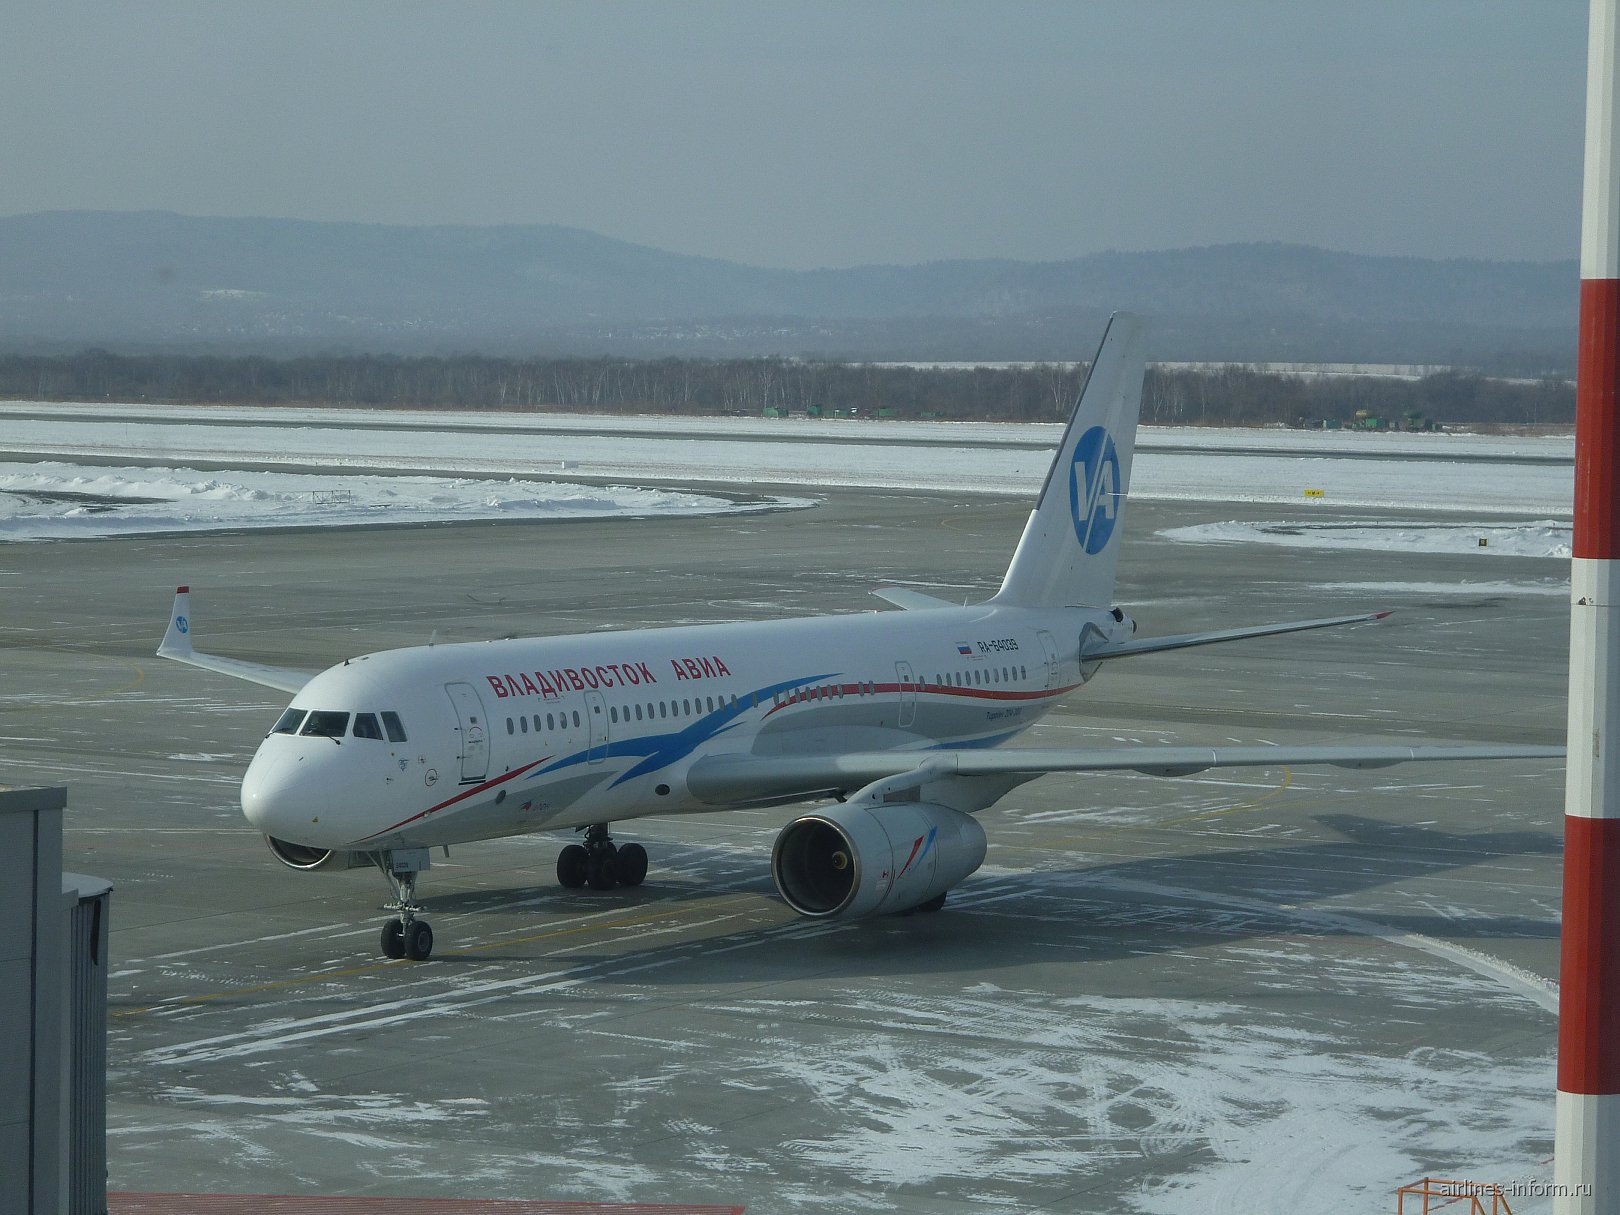 Самолет Ту-204-300 авиакомпании Владивосток авиа